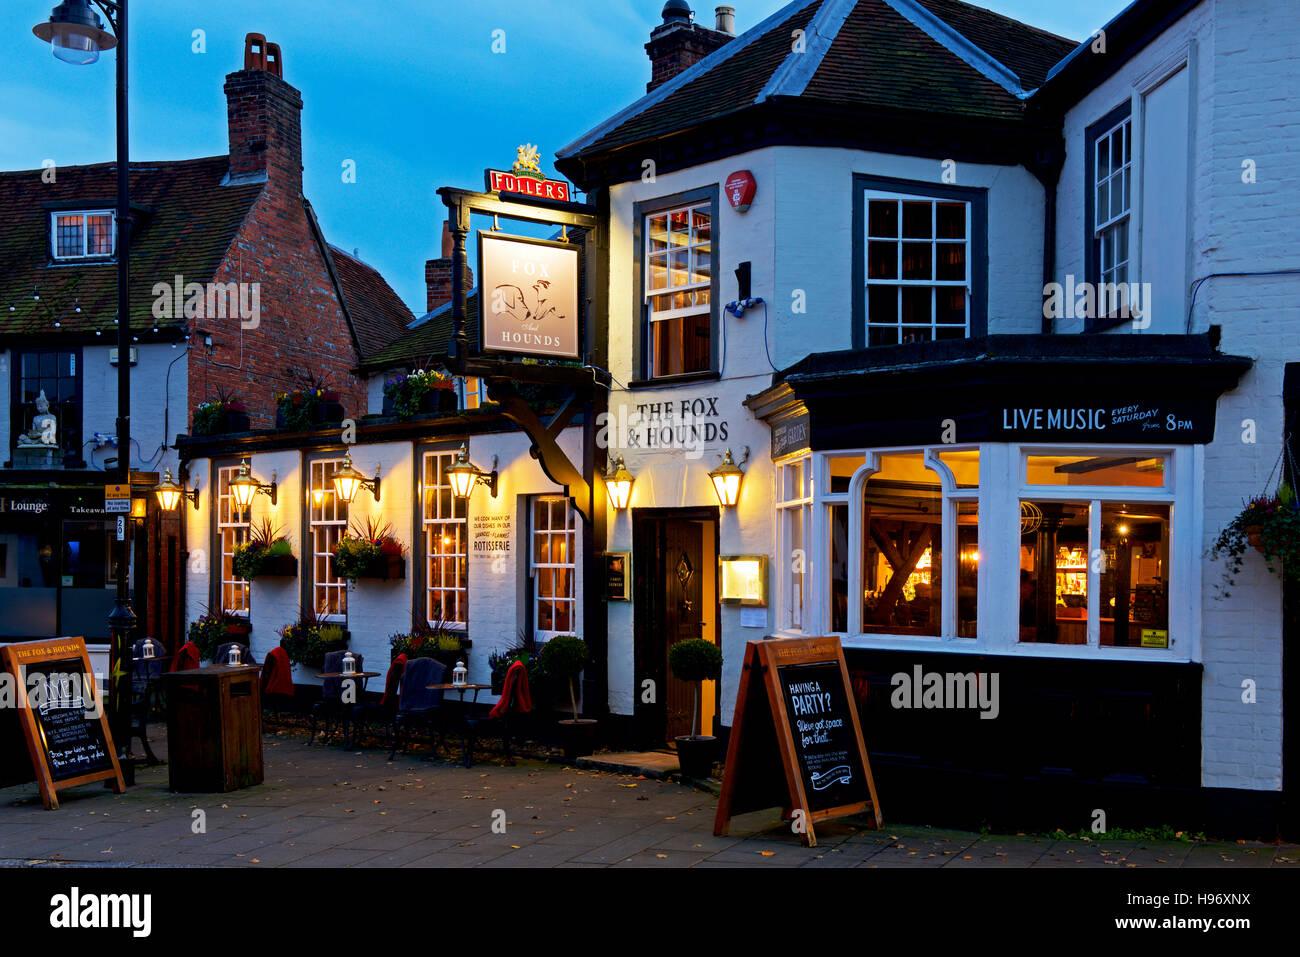 The Fox & Hounds pub in Lyndhurst, Hampshire, England UK - Stock Image